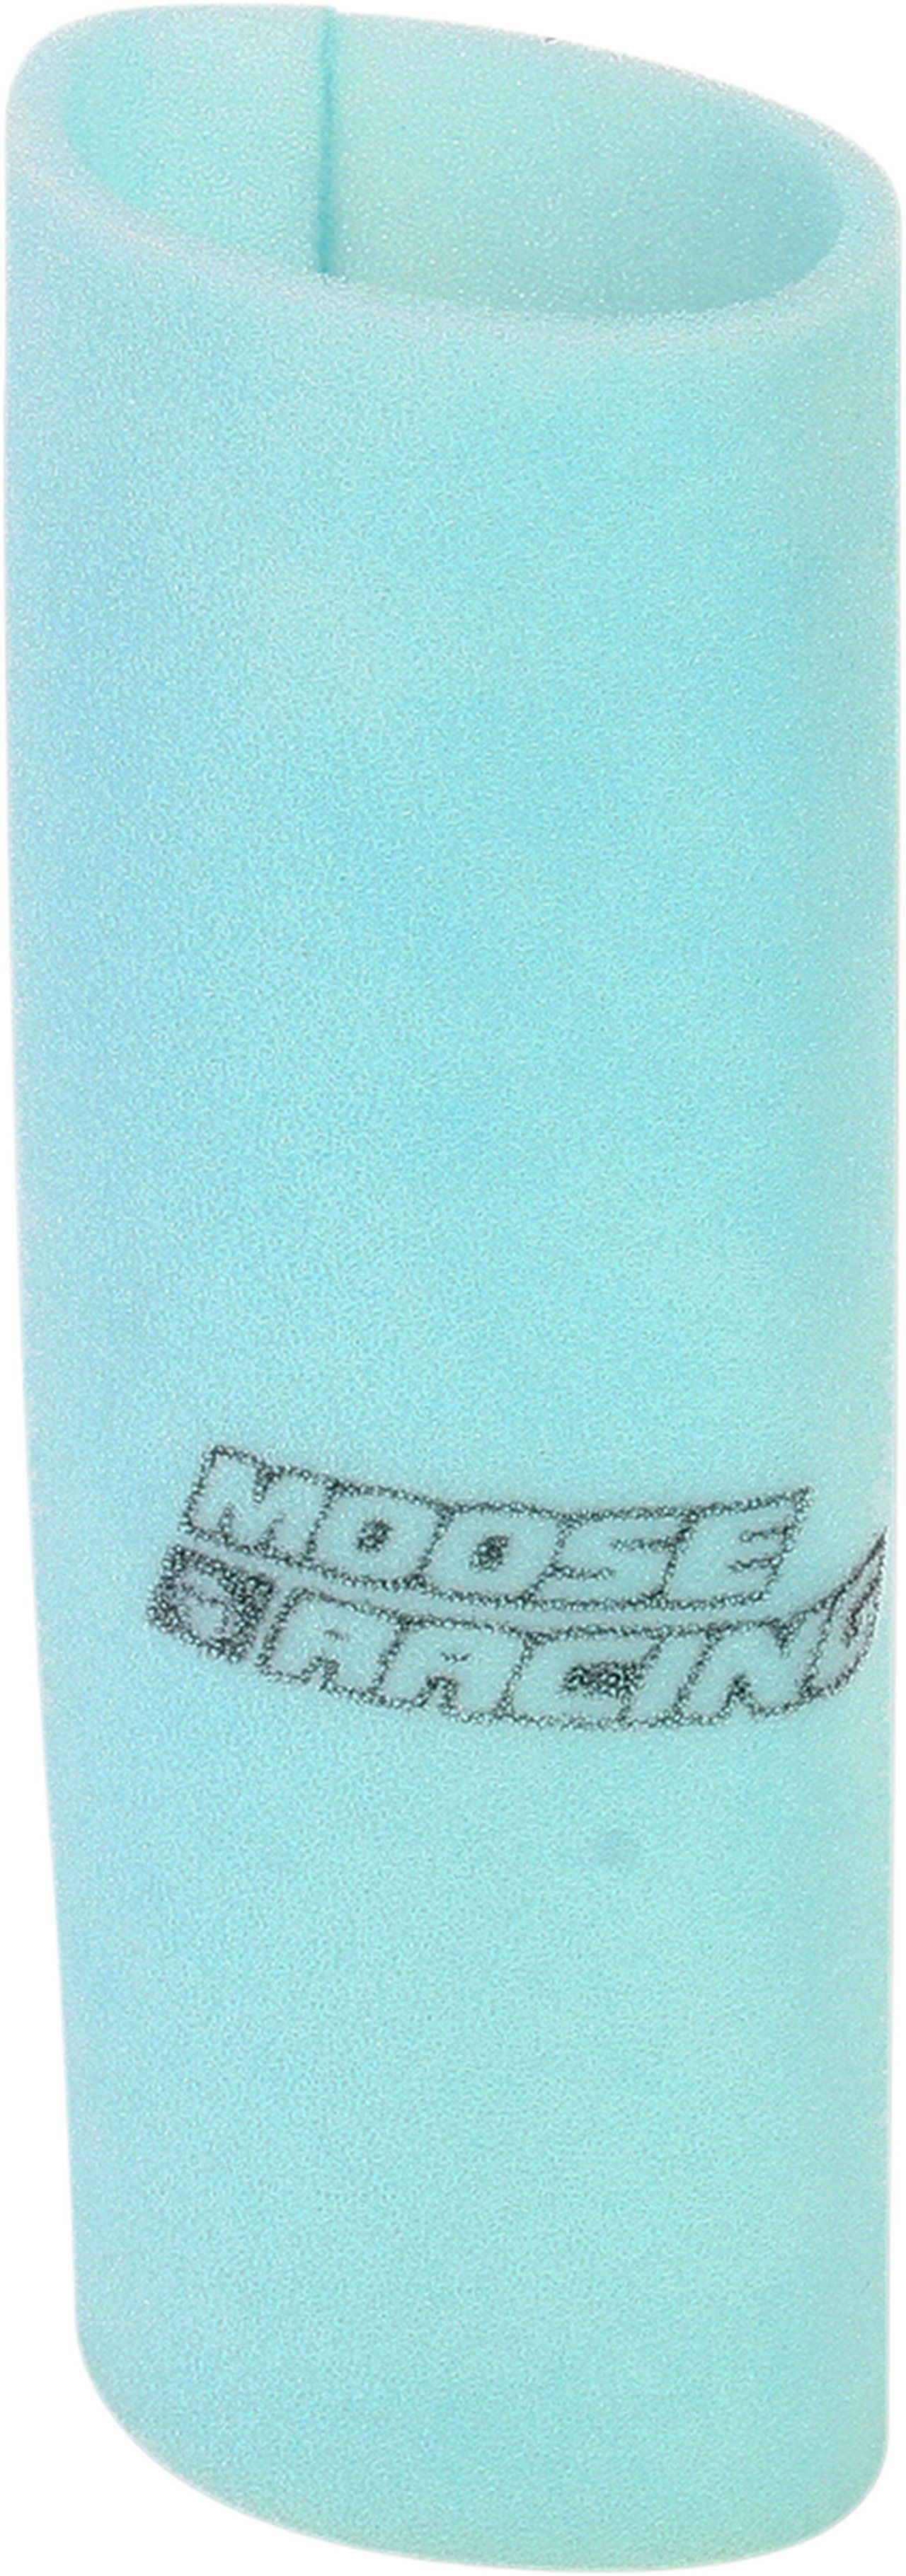 【MOOSE RACING】PPO (PRECISION PRE-OILED) 空氣濾芯 [1011-2784] - 「Webike-摩托百貨」